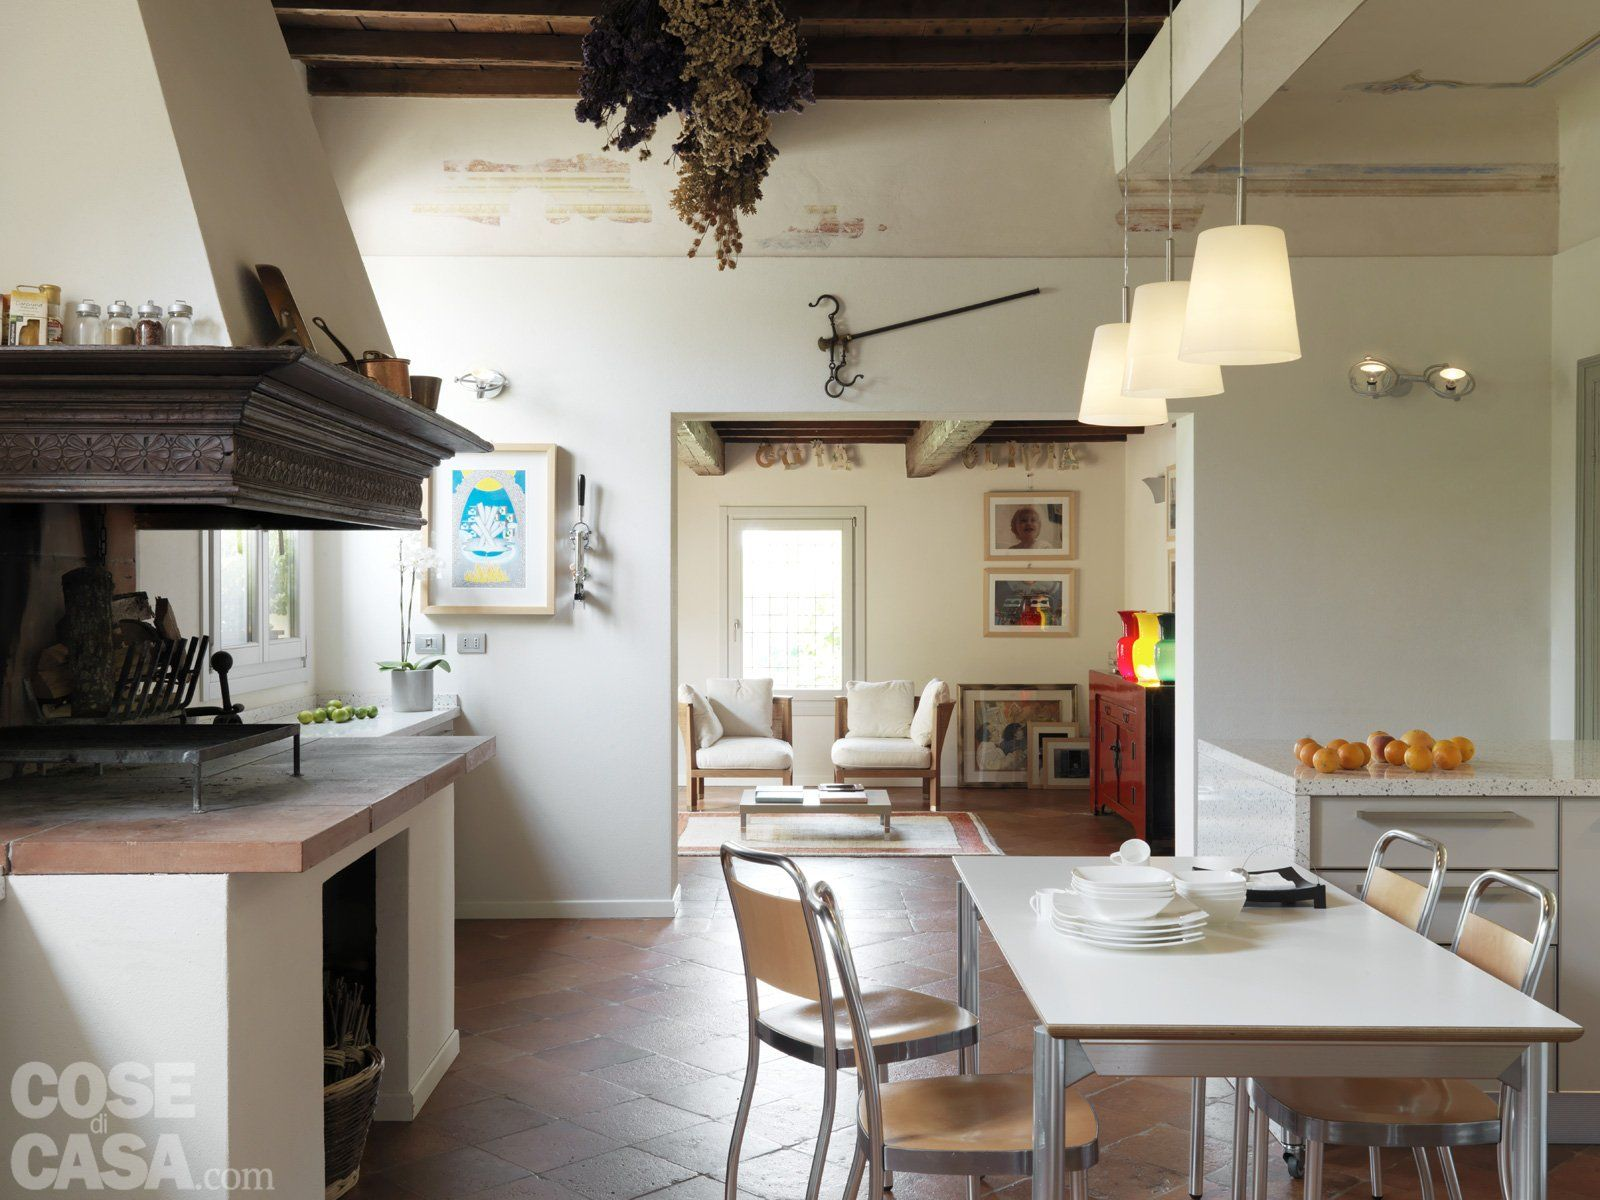 Idee divisori cucina soggiorno ~ avienix.com for . | My photographs ...